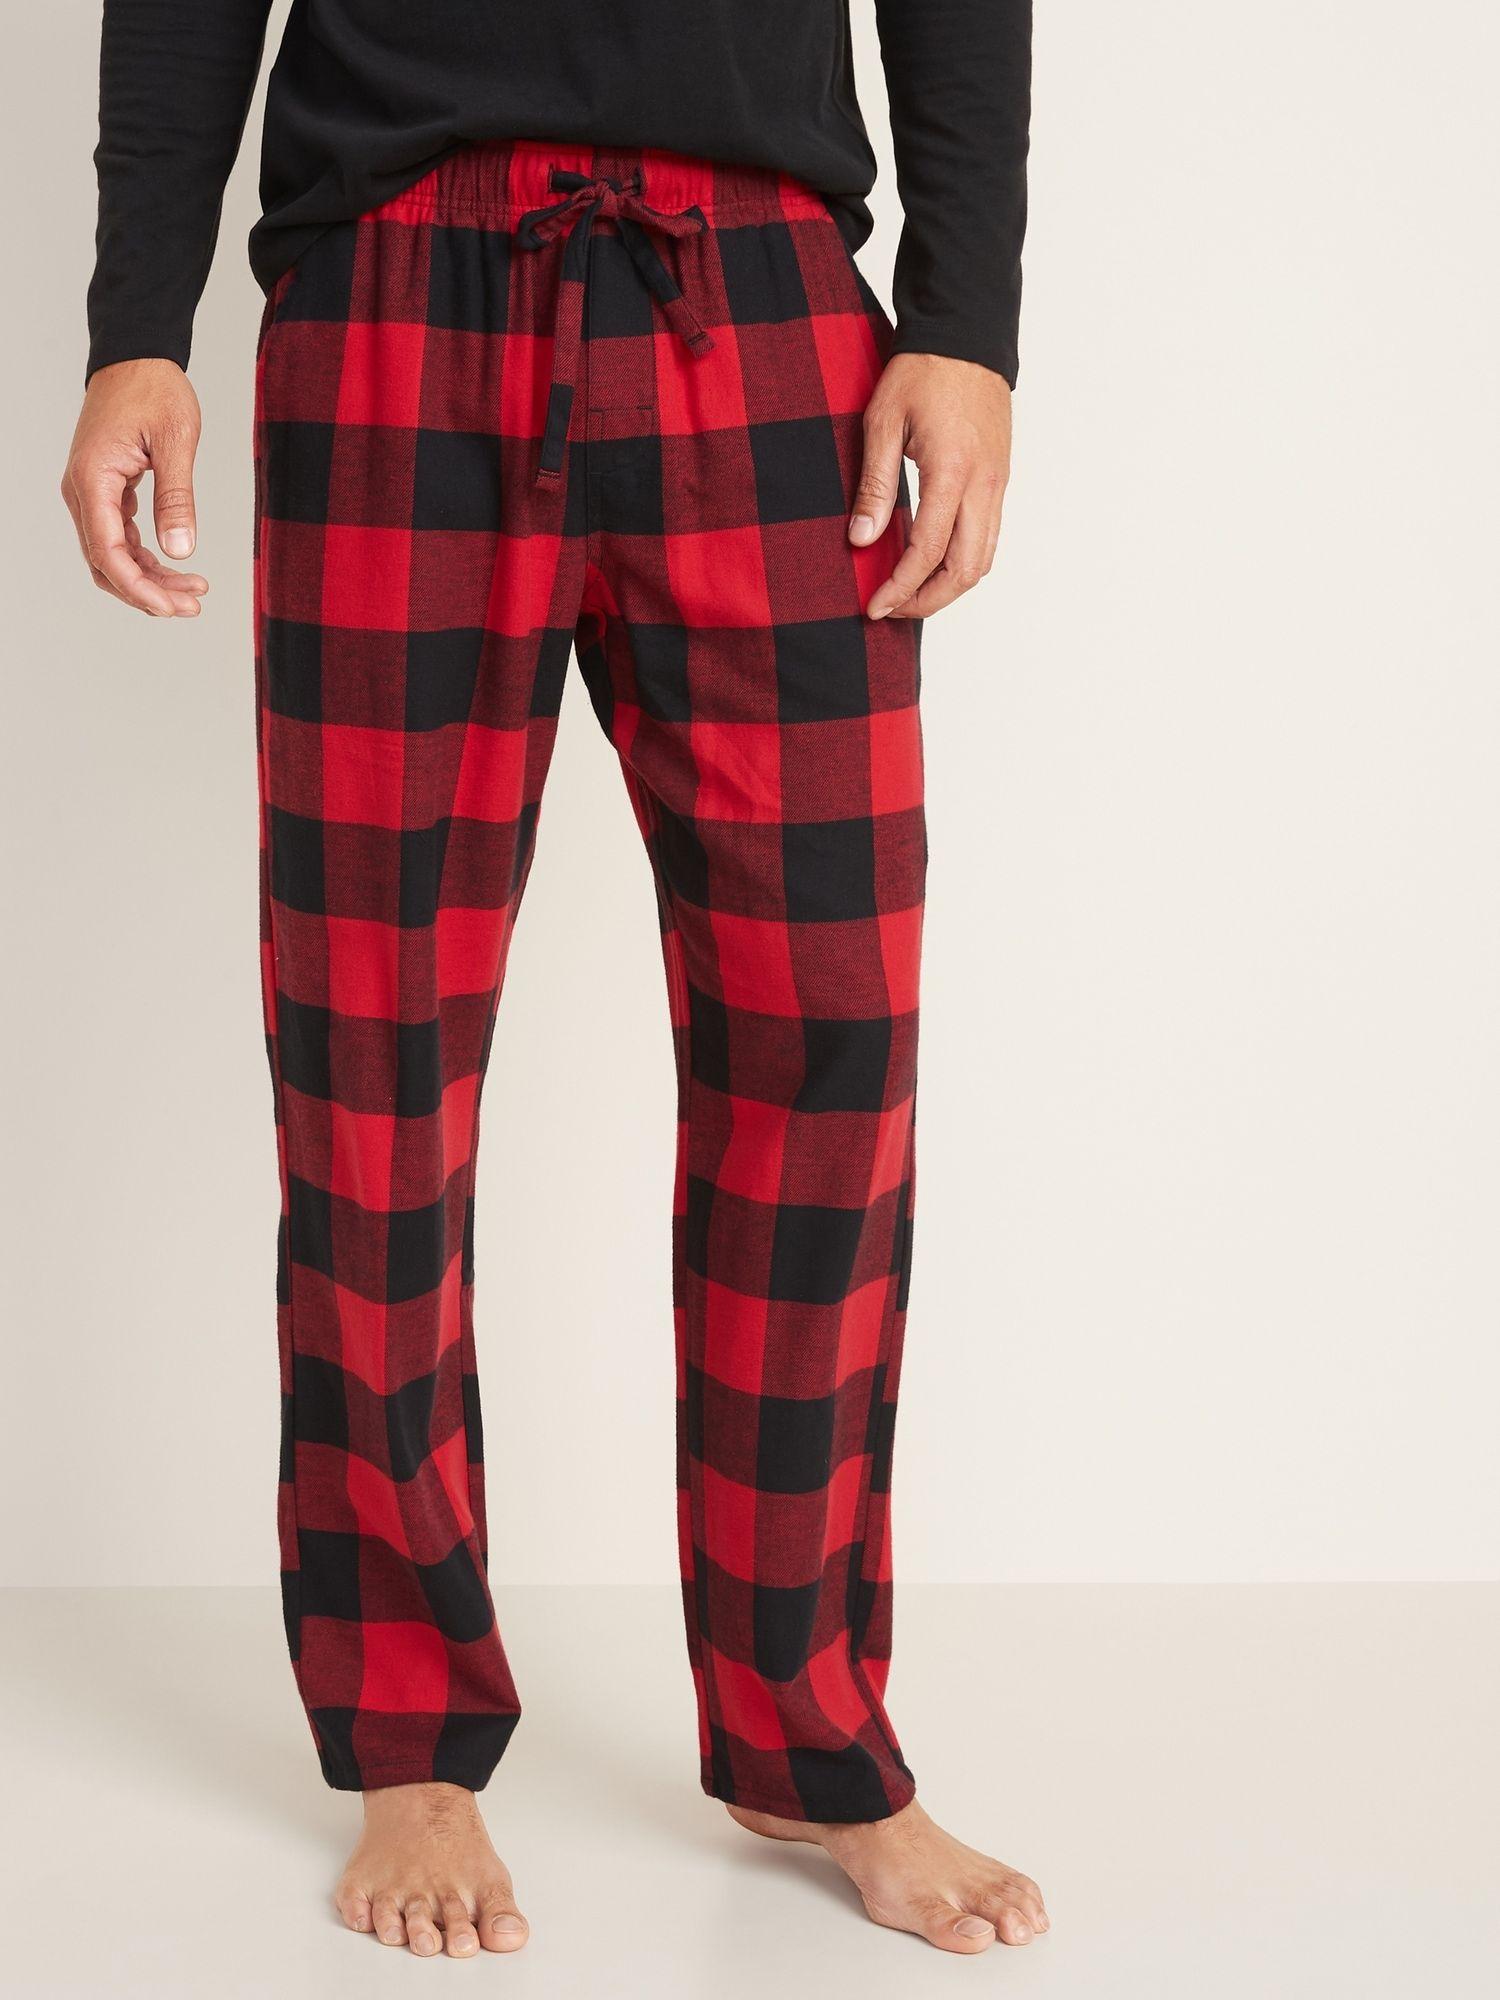 Patterned Flannel Pajama Pants for Men Old Navy